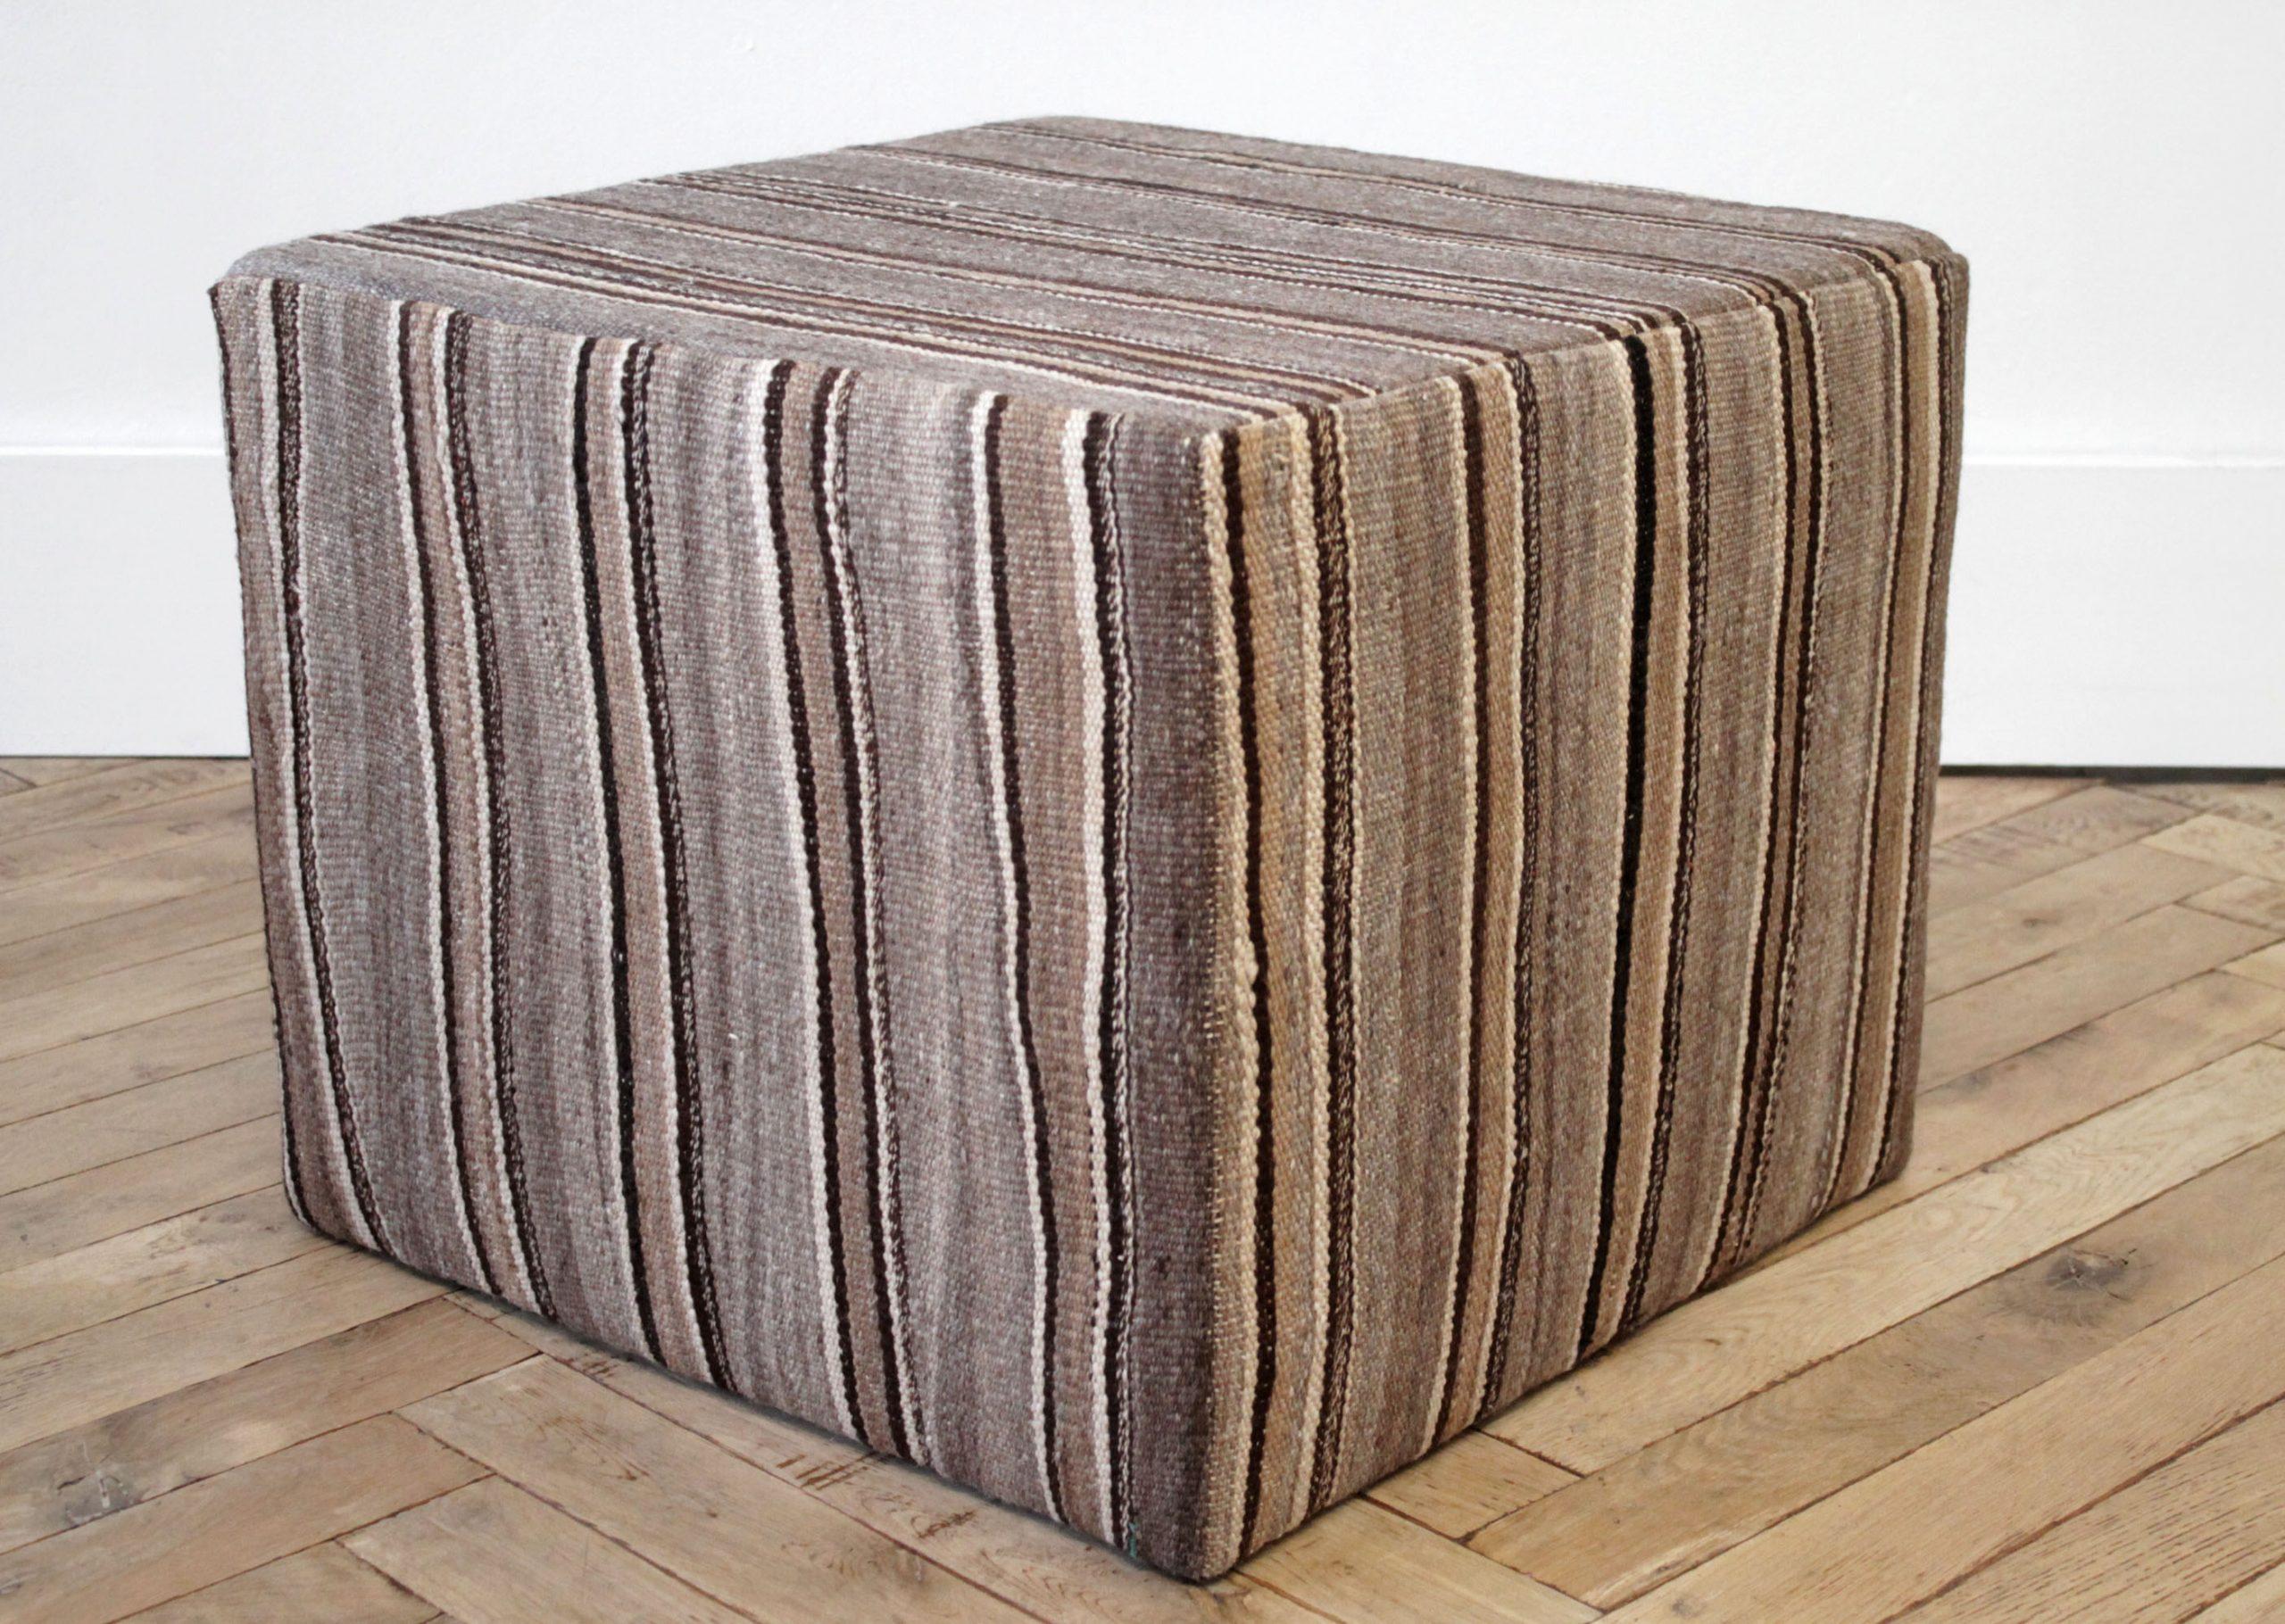 Vintage Rug Cube Ottoman in Warm Brown Tones